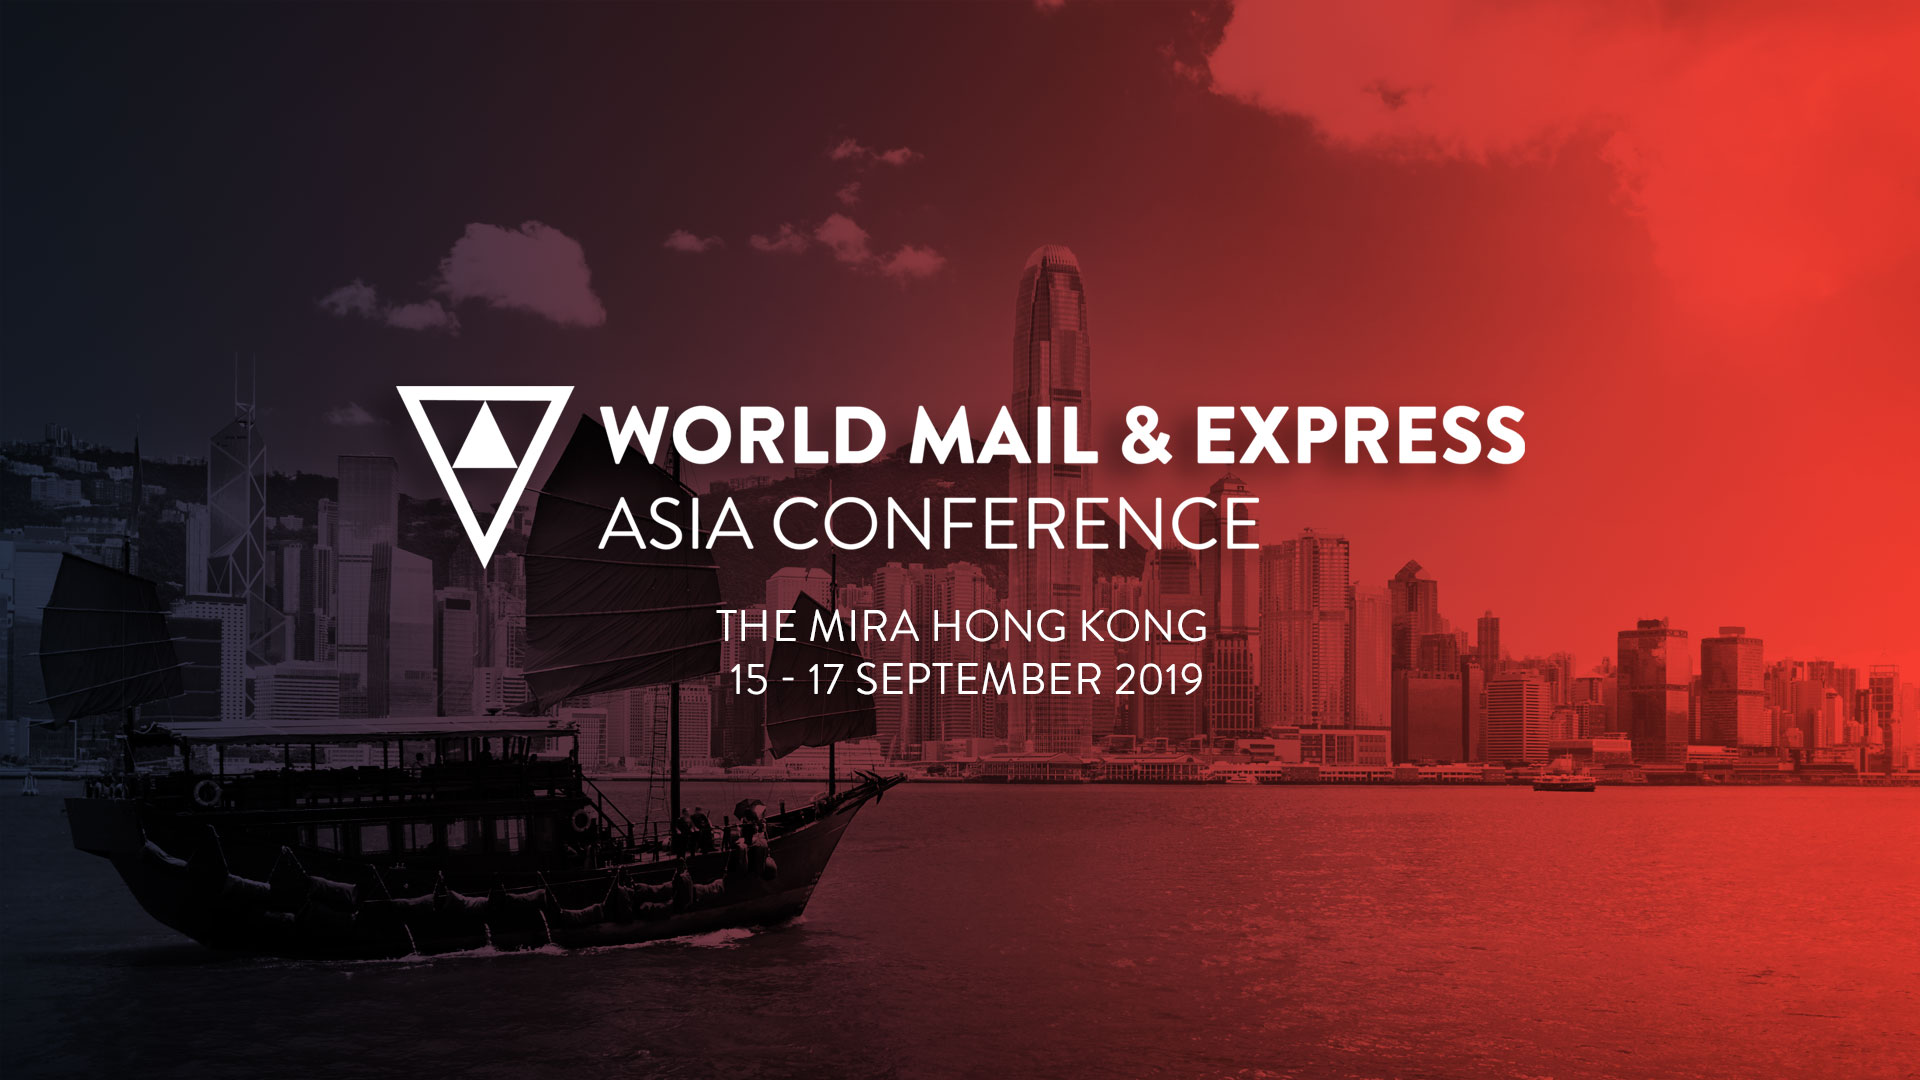 WMX Asia 2019